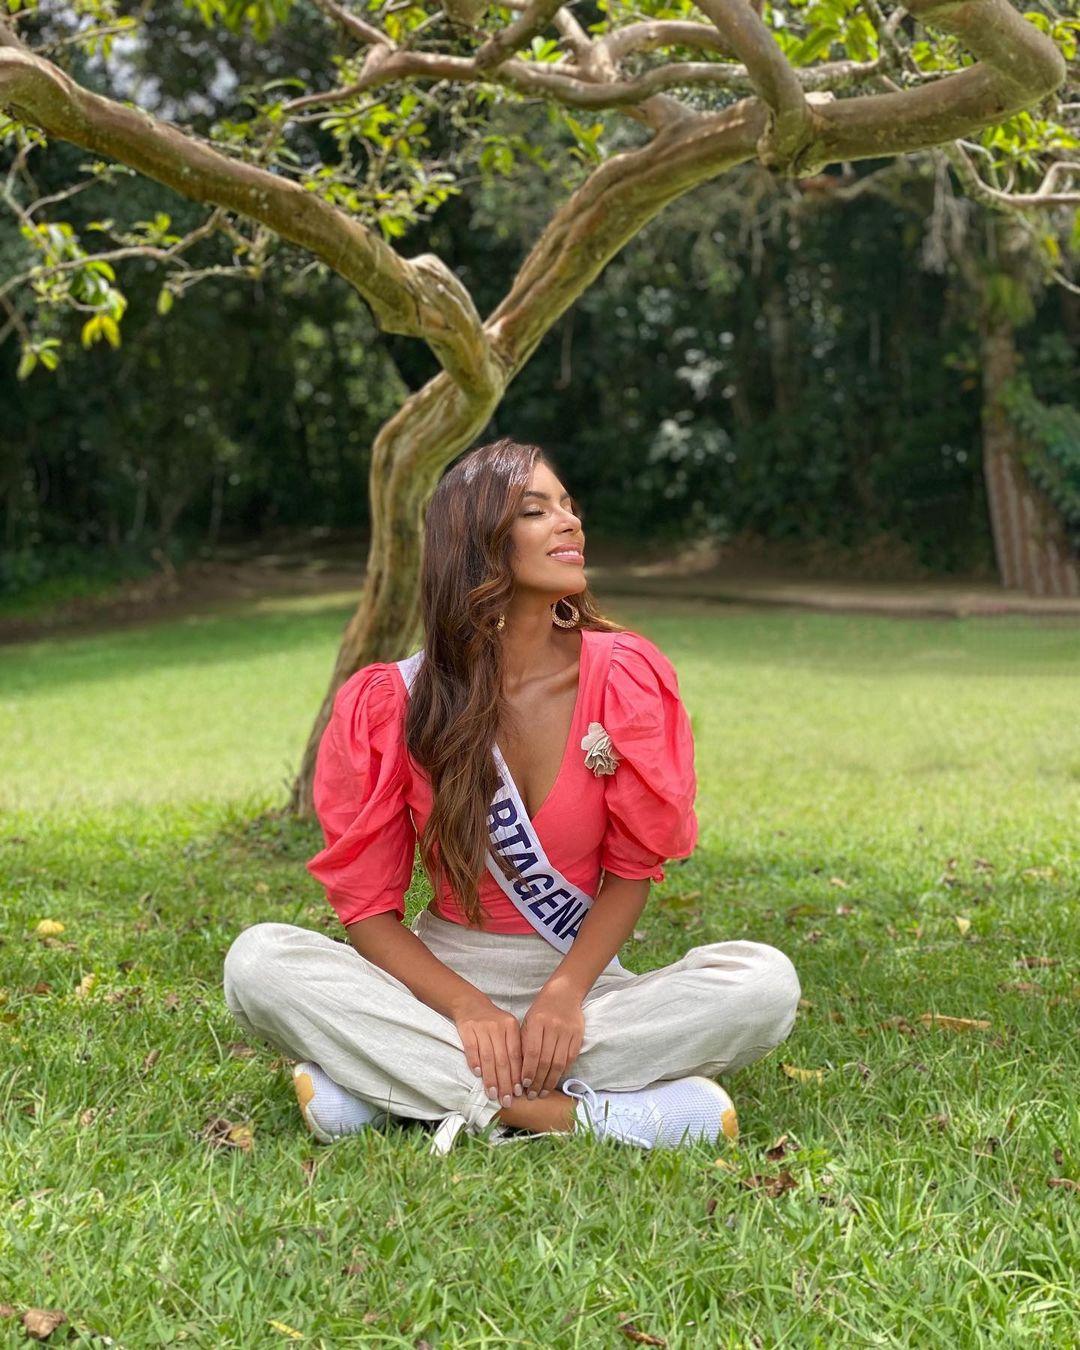 valeria ayos bossa, miss universe colombia 2021/miss water earth 2018. - Página 21 24146212